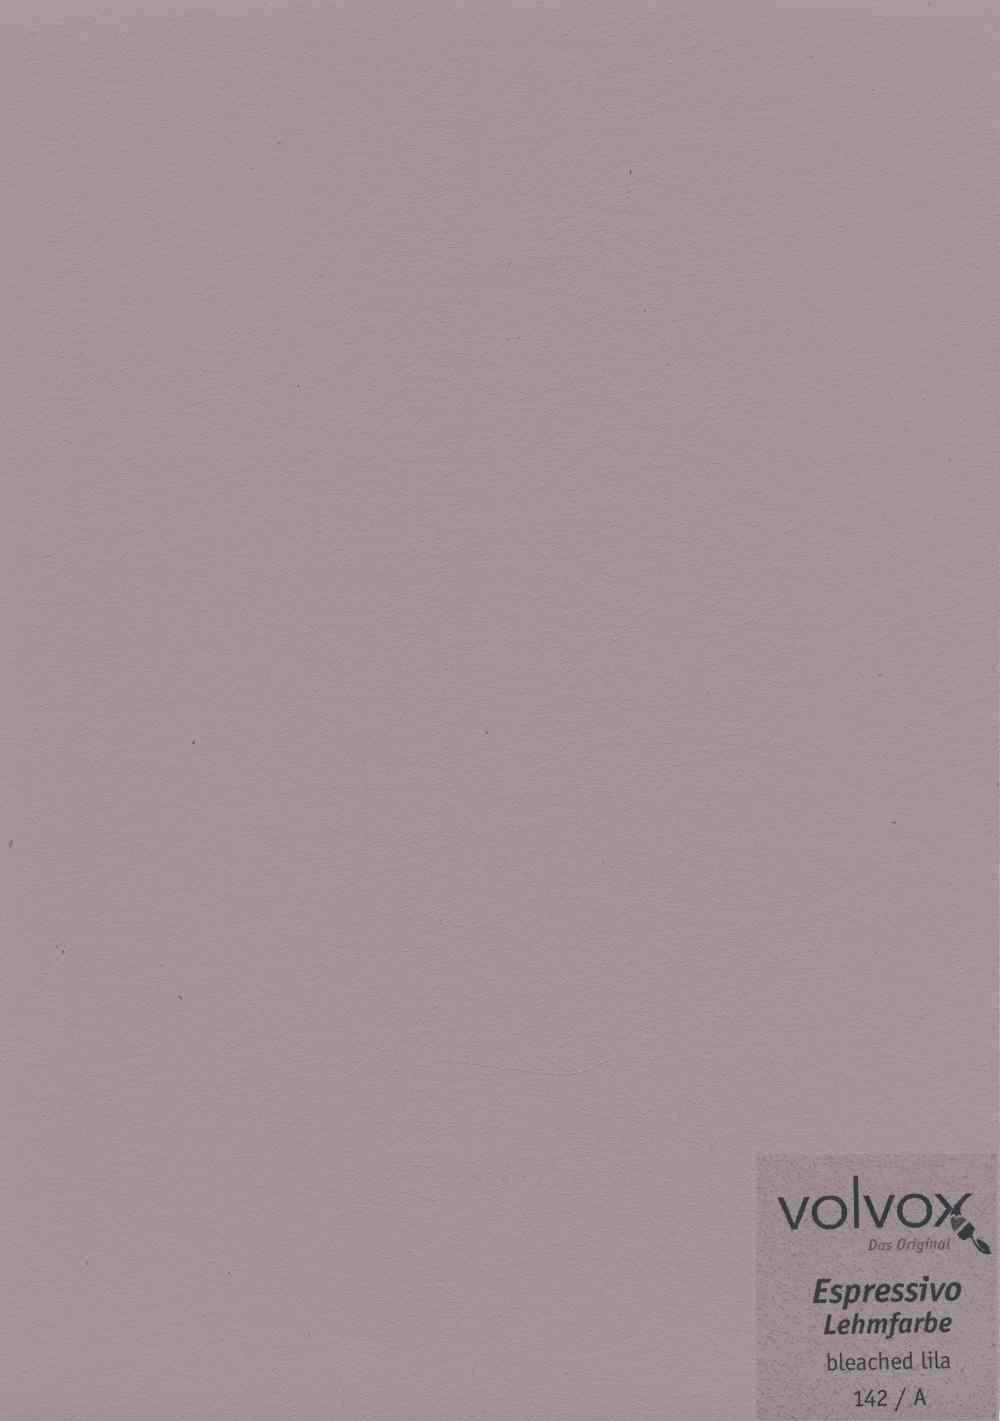 Volvox Espressivo Lehmfarbe 142 bleached lila